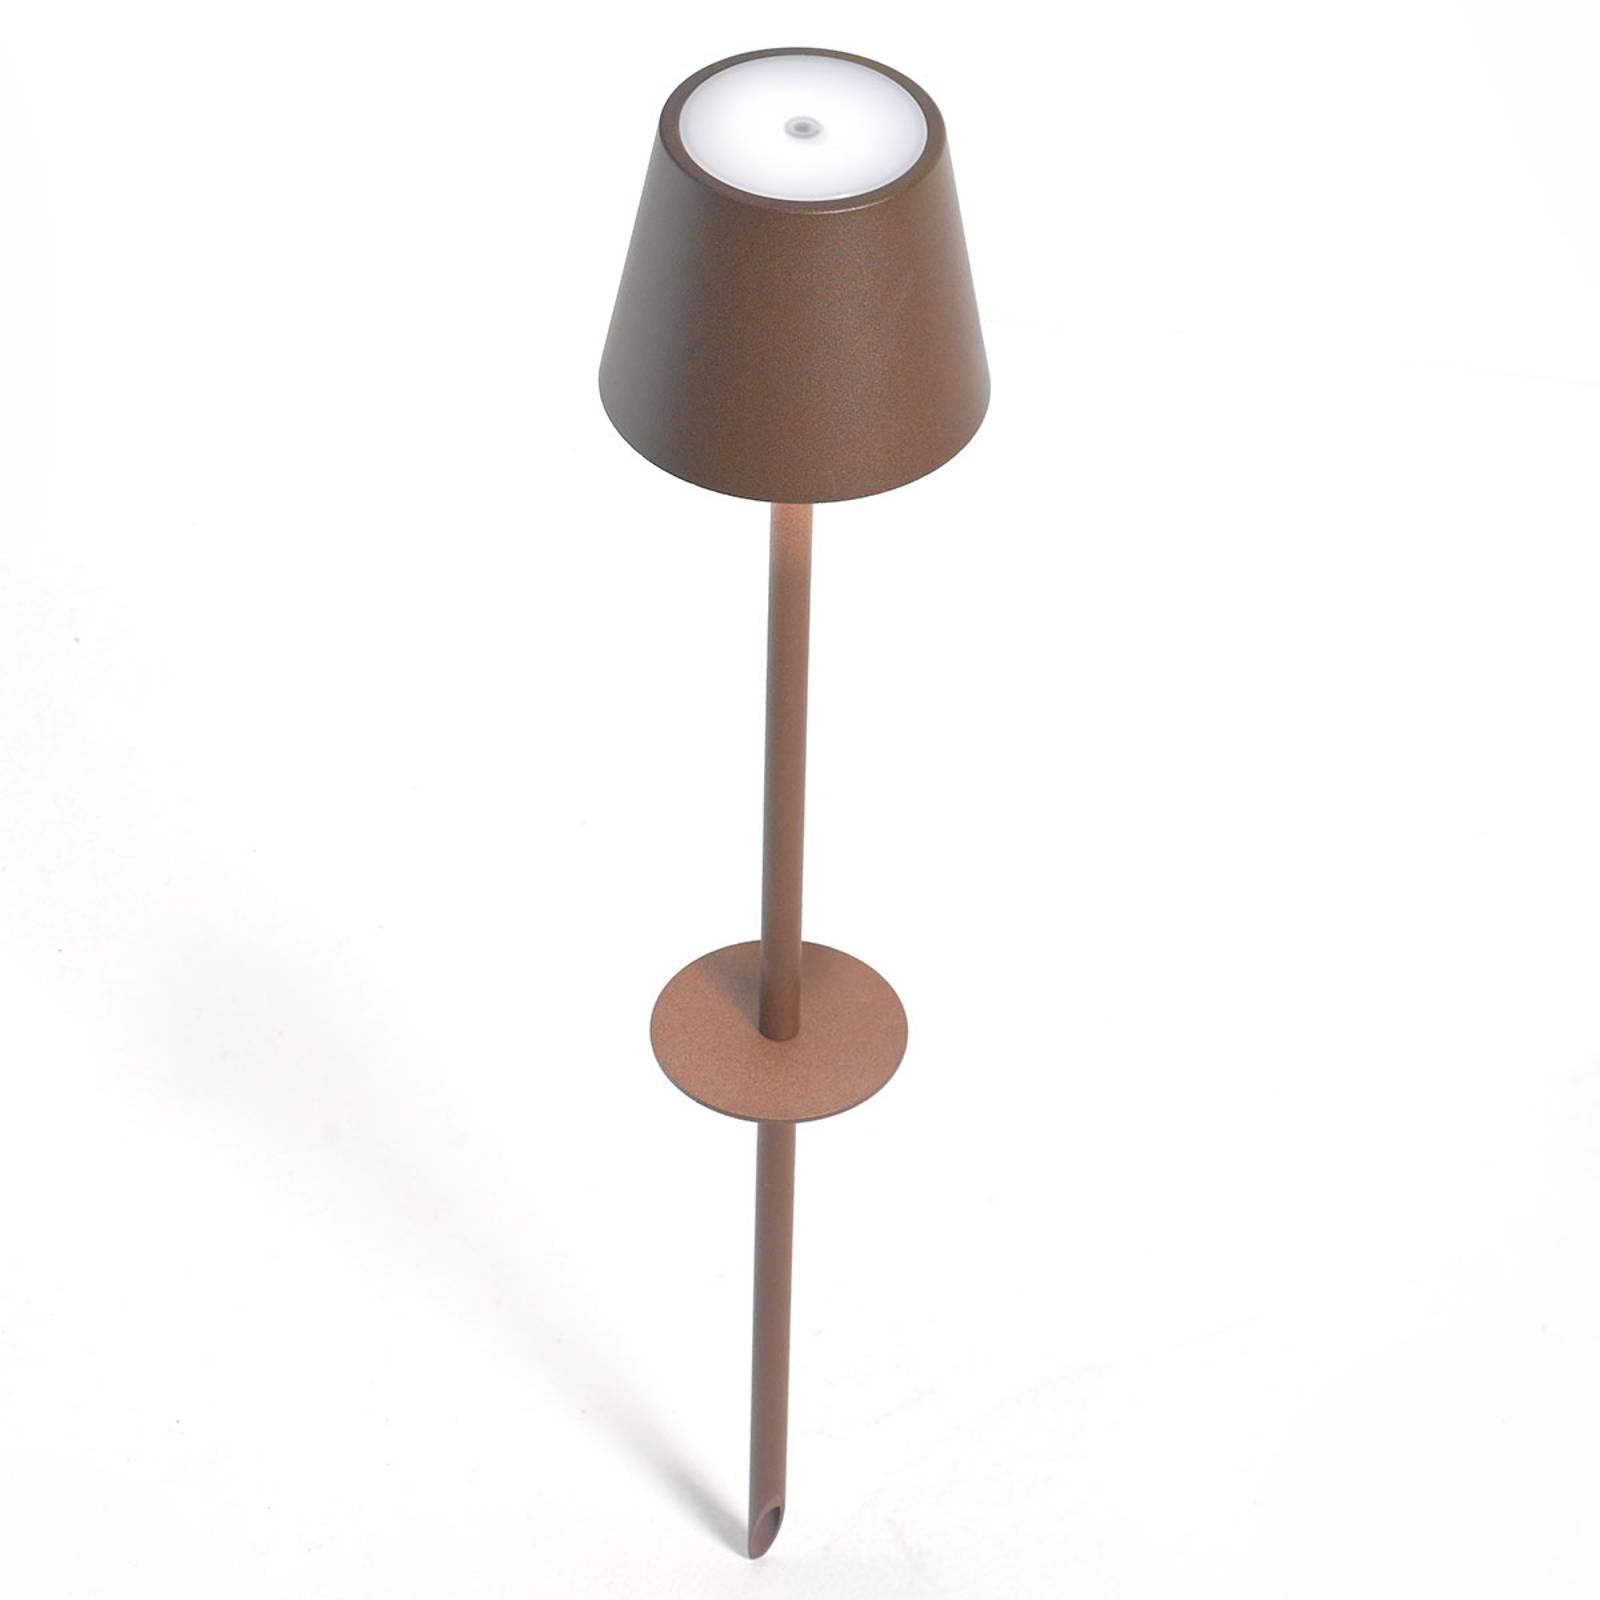 LED-maapiikkivalo Poldina-akku, ruskea, 135 cm